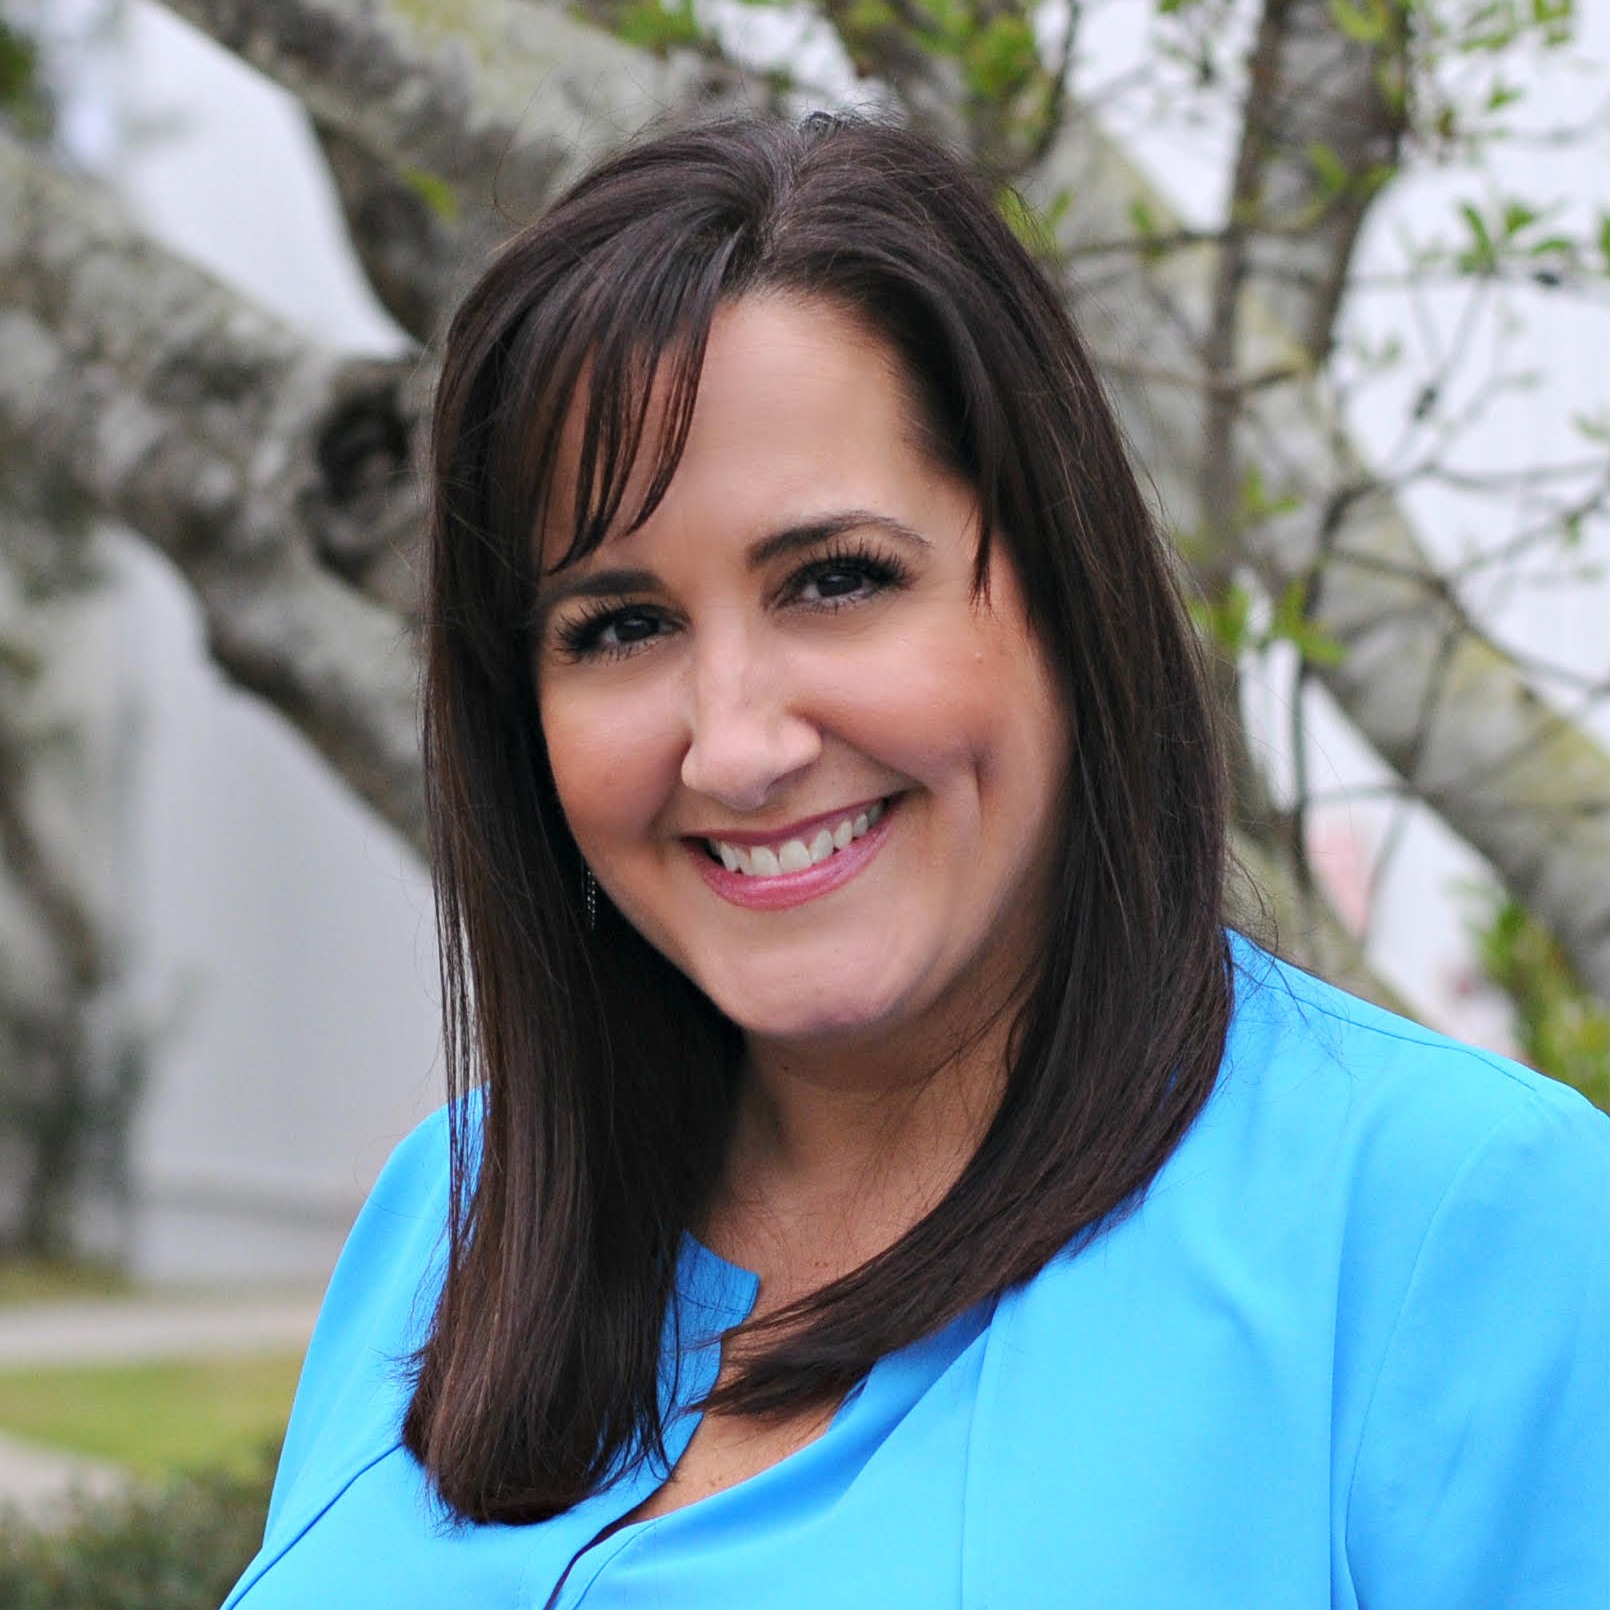 Vicki Karnes